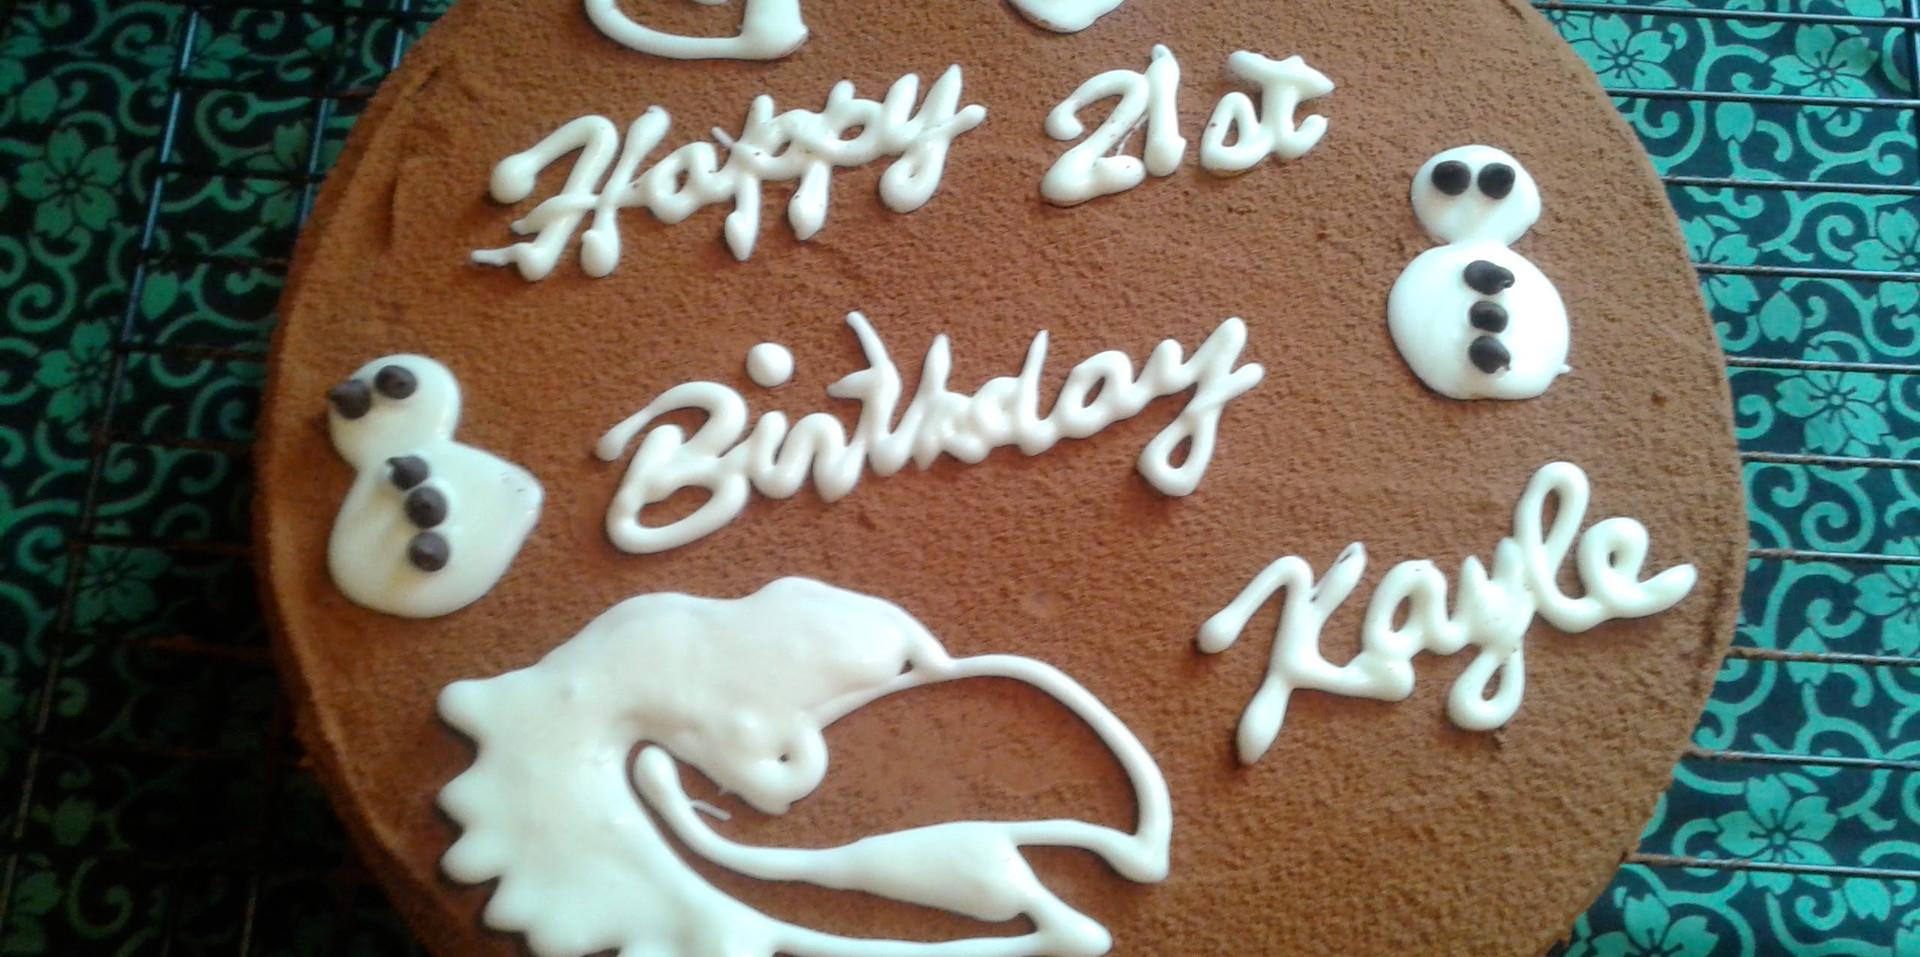 Custom Birthday Cake with Cocoa